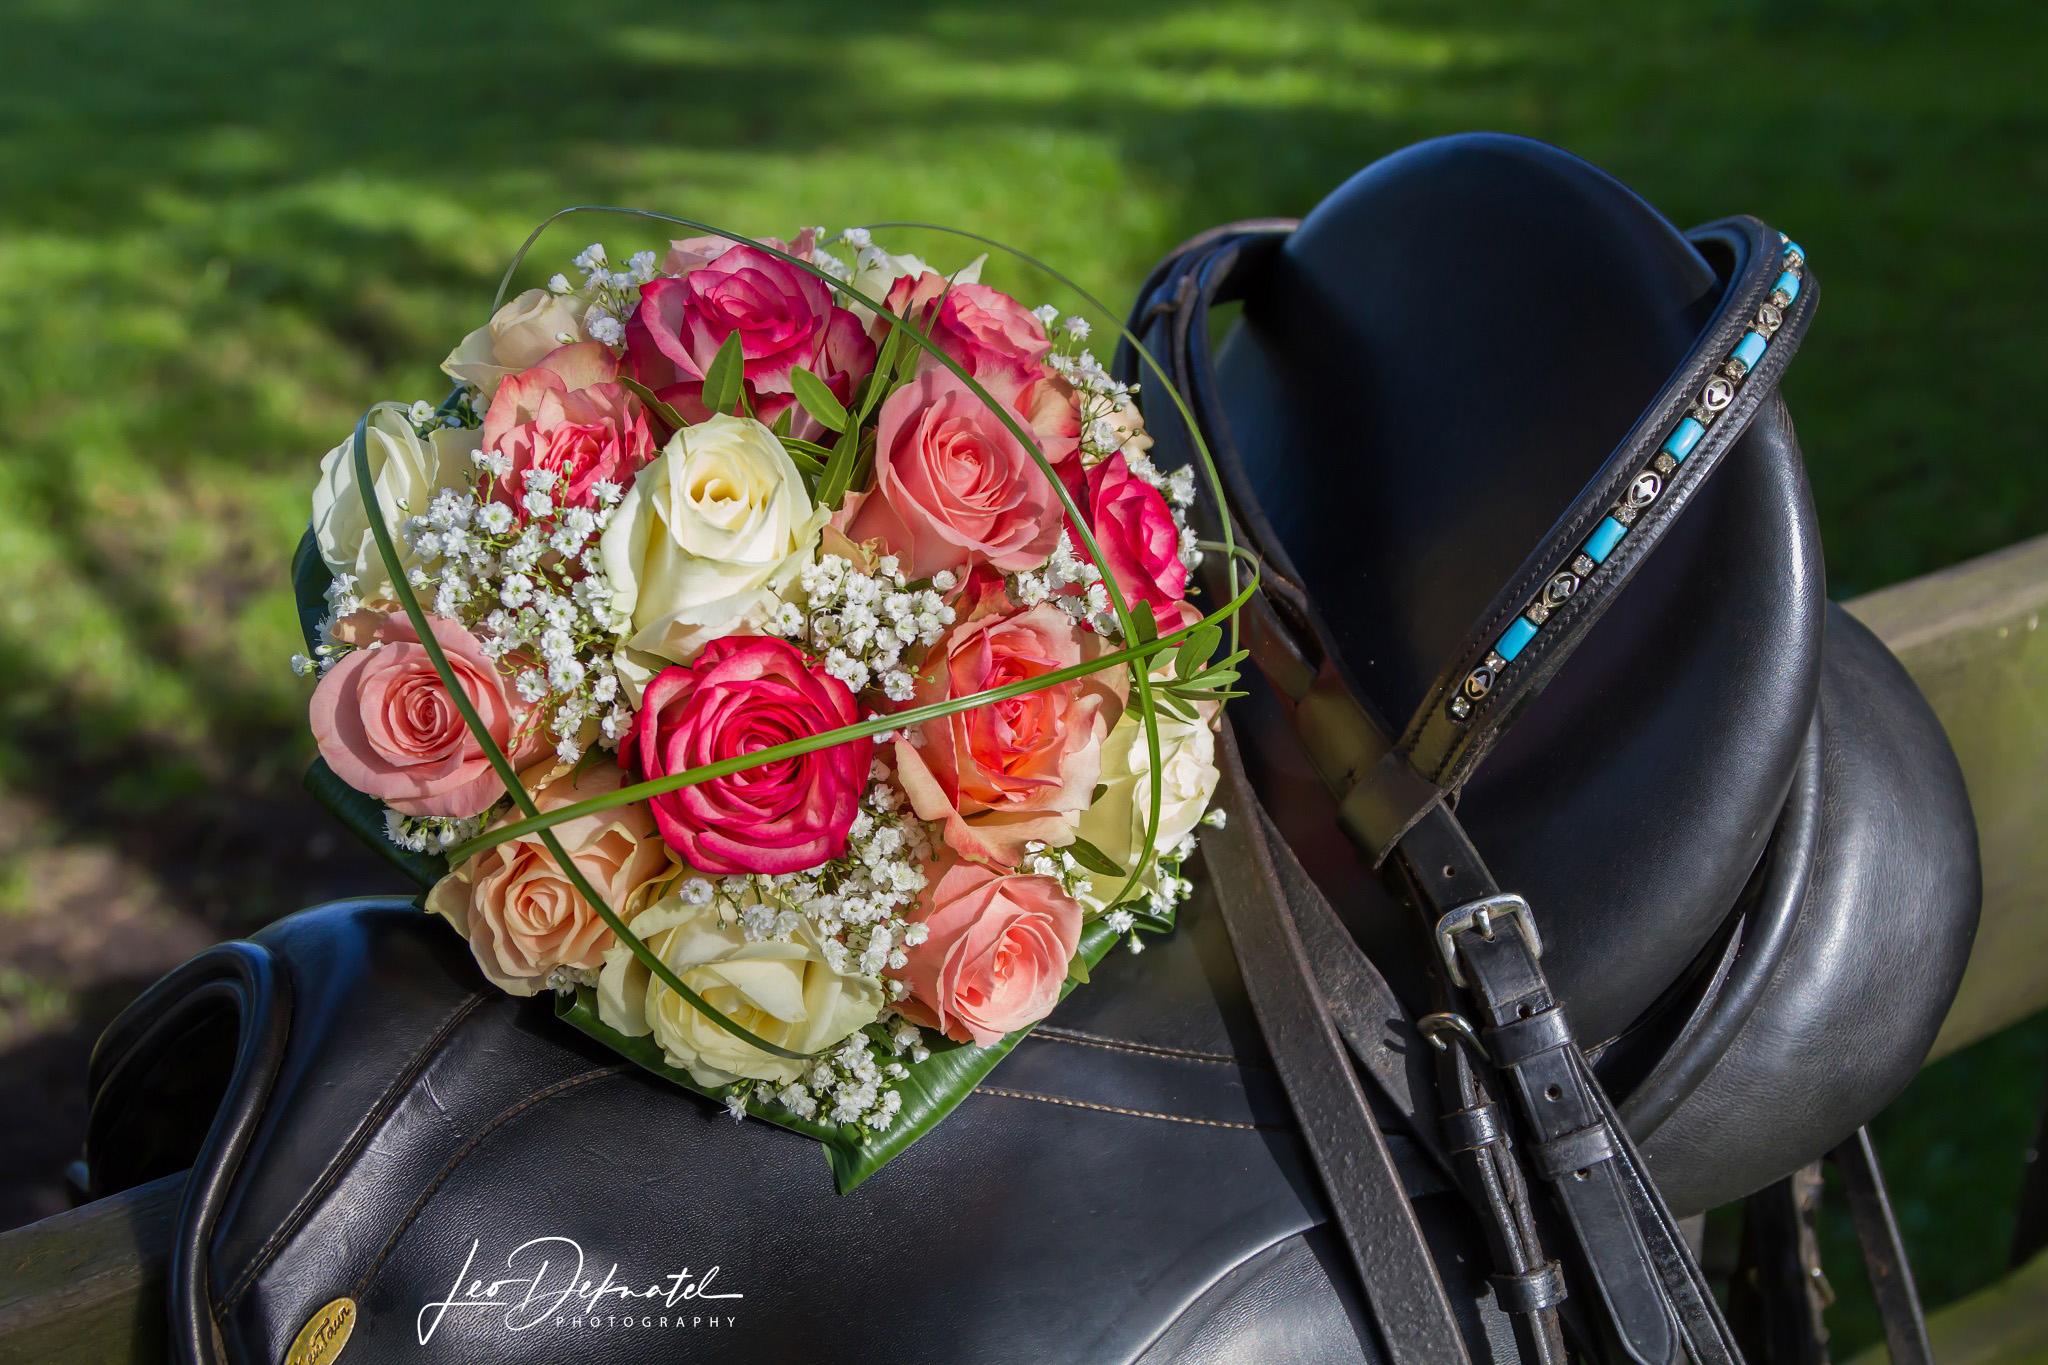 Bruidsboeket, Boeket, Bloemen, Bruidsreportage, Fotografie